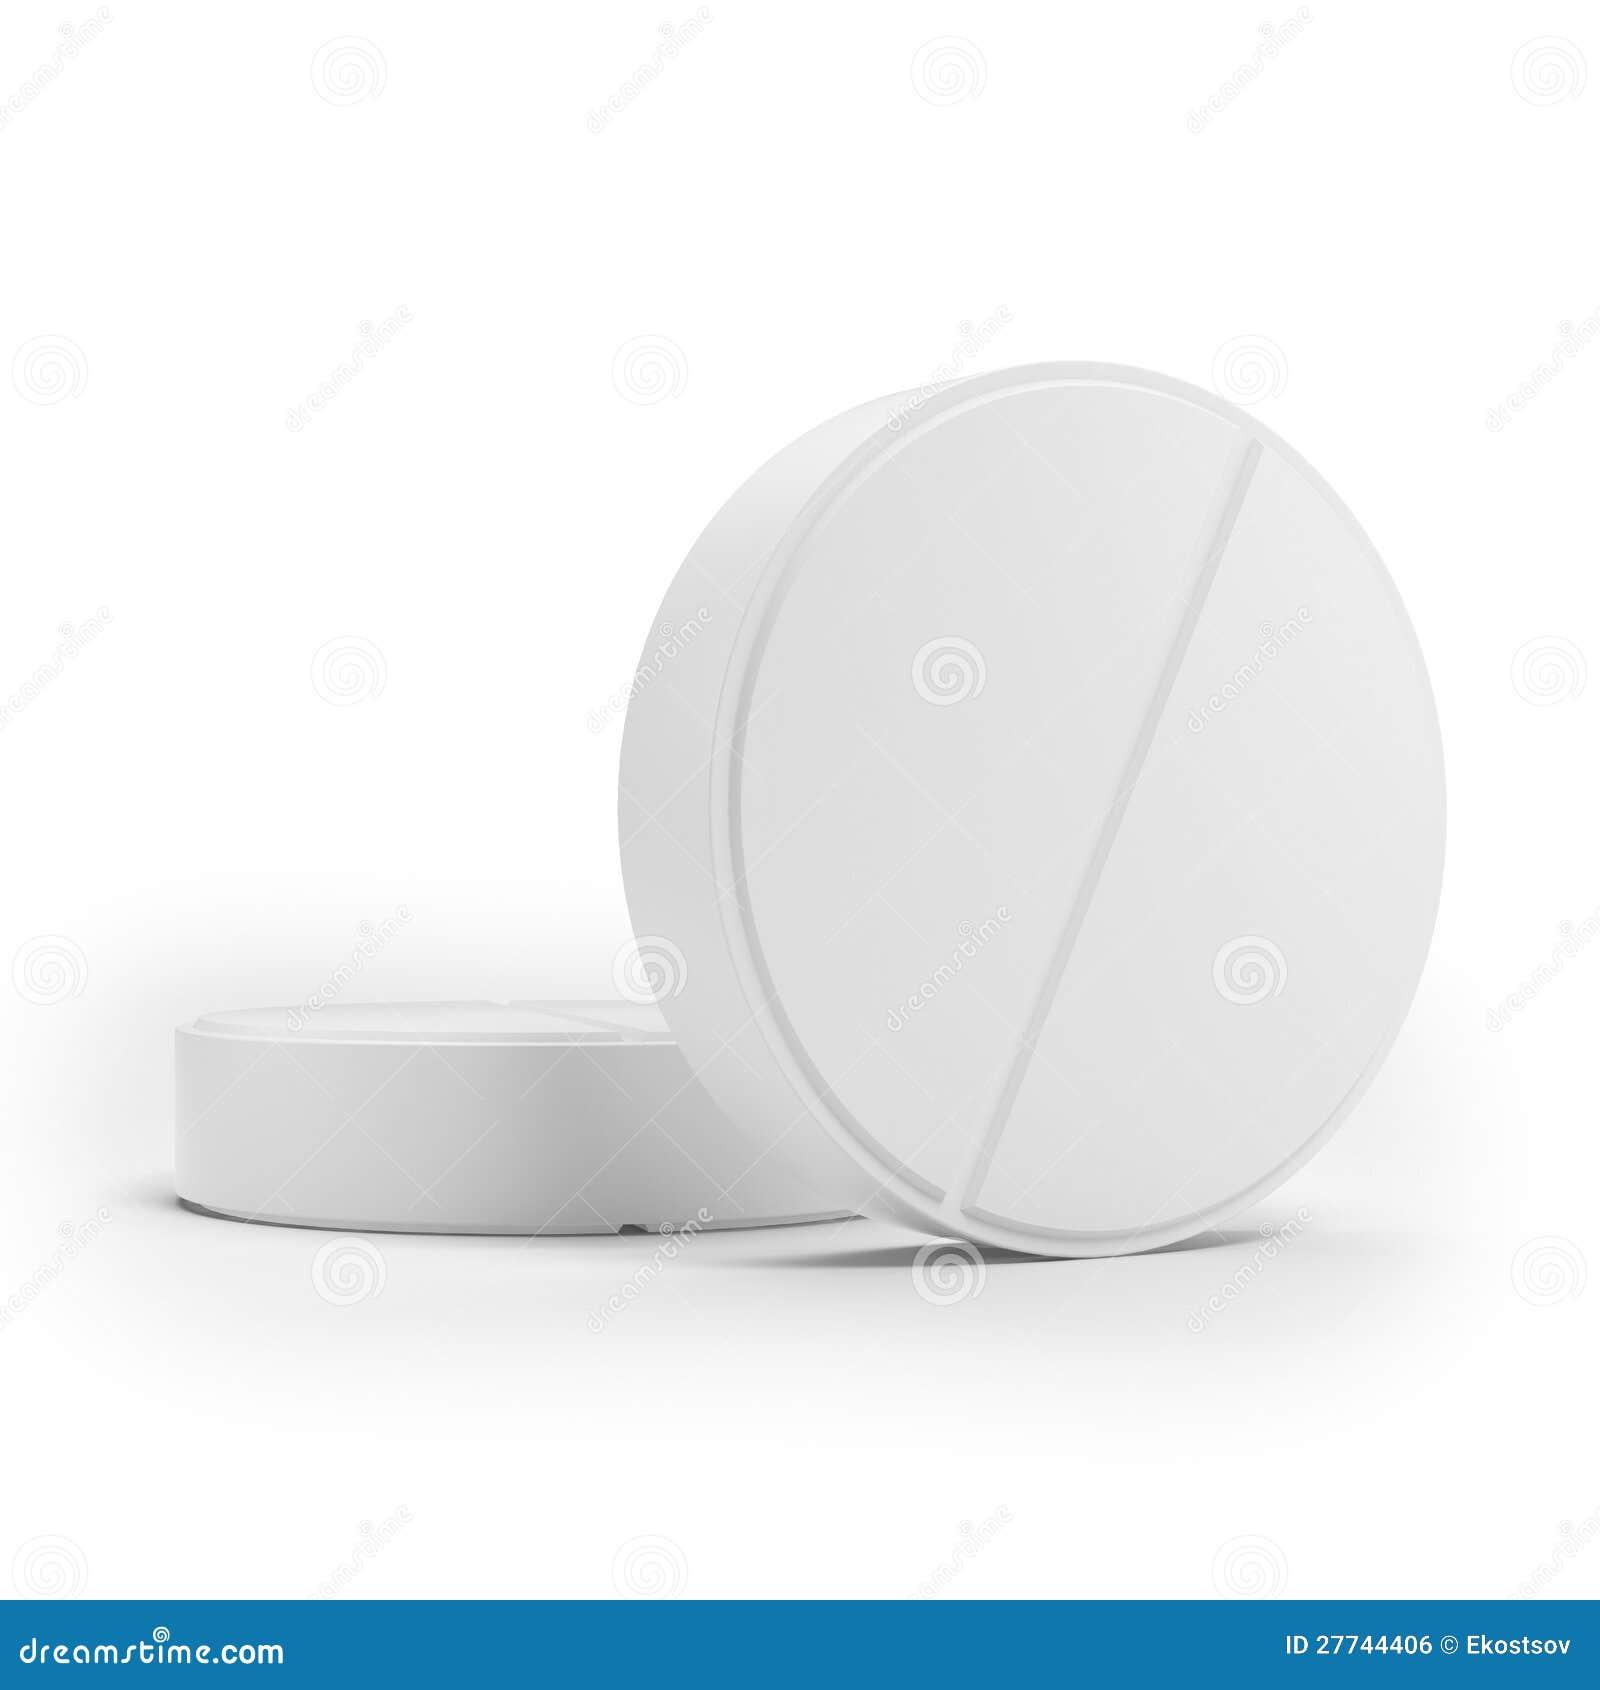 Viagra pills review